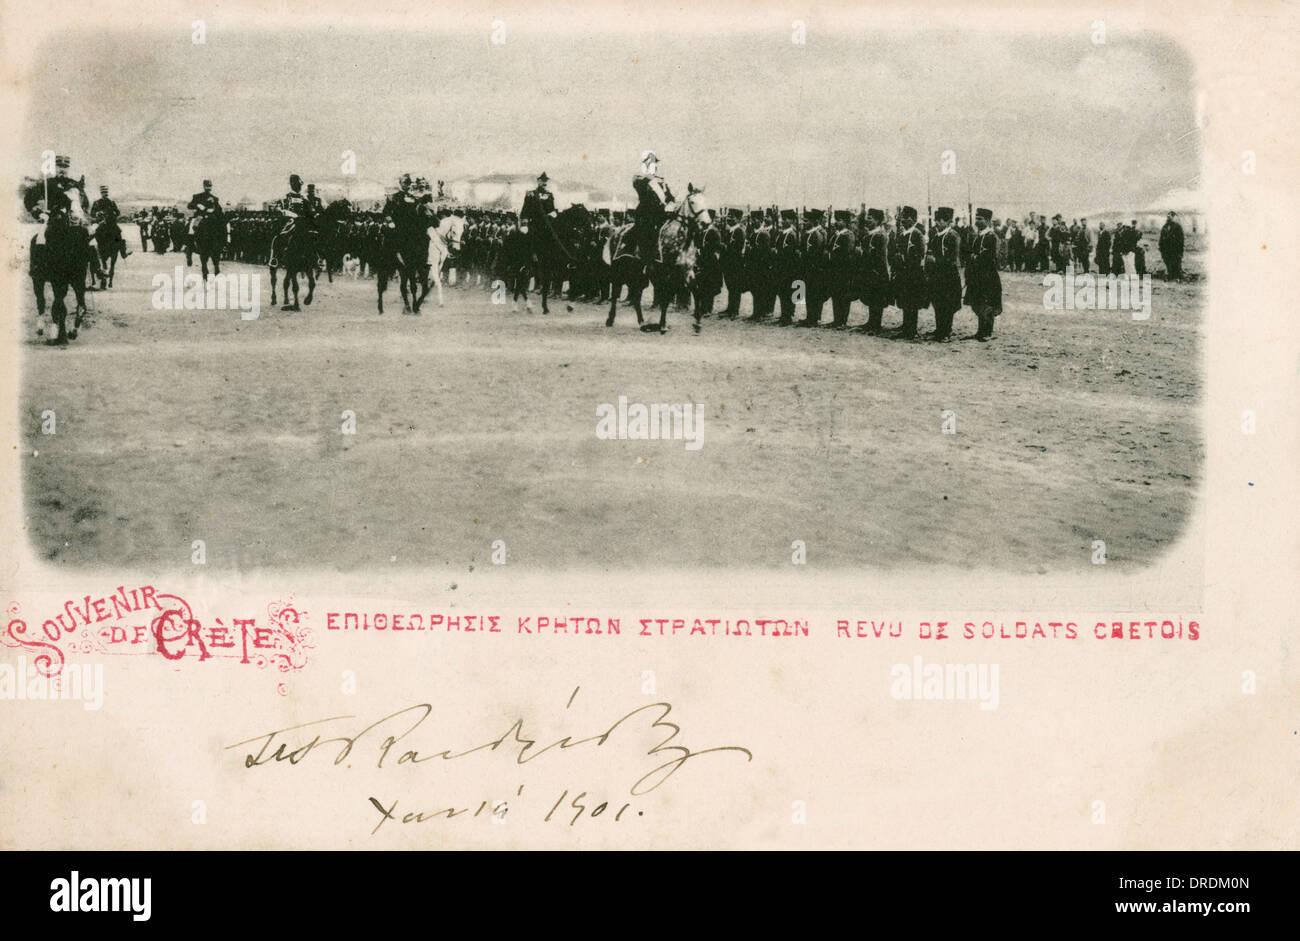 Prince George reviews the Cretan Gendarmerie - Stock Image